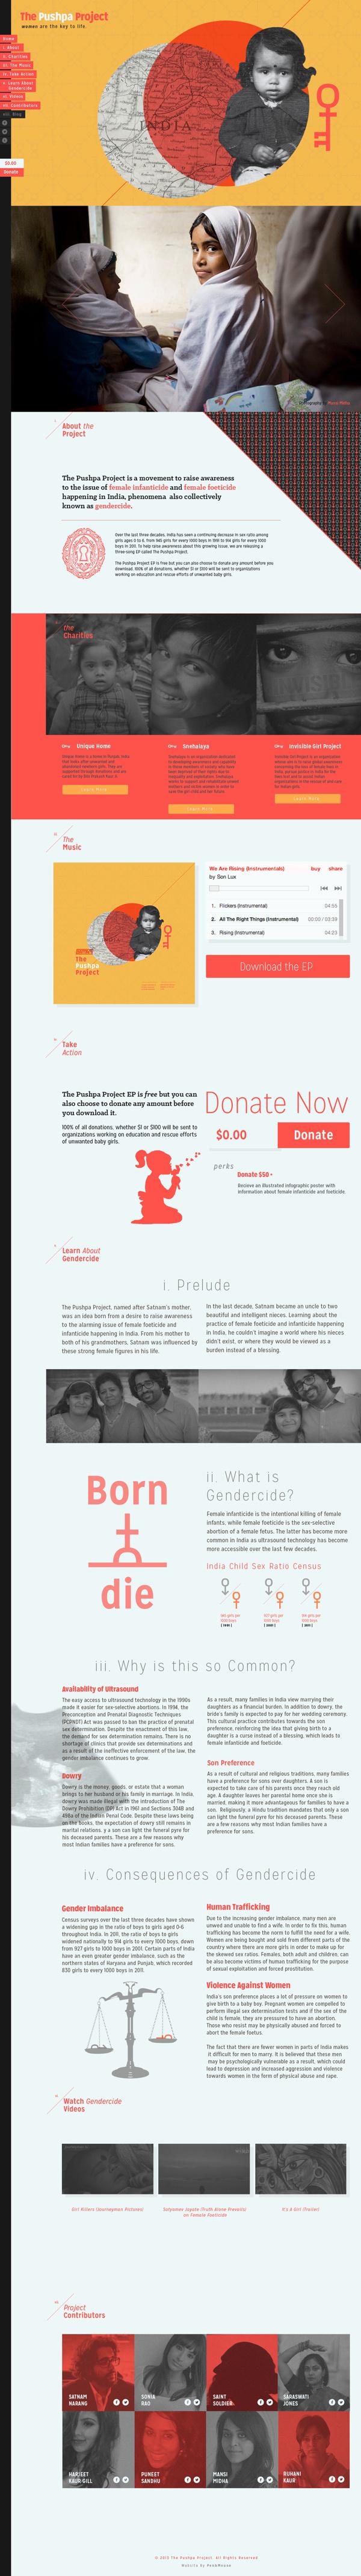 Pushpa Project Website